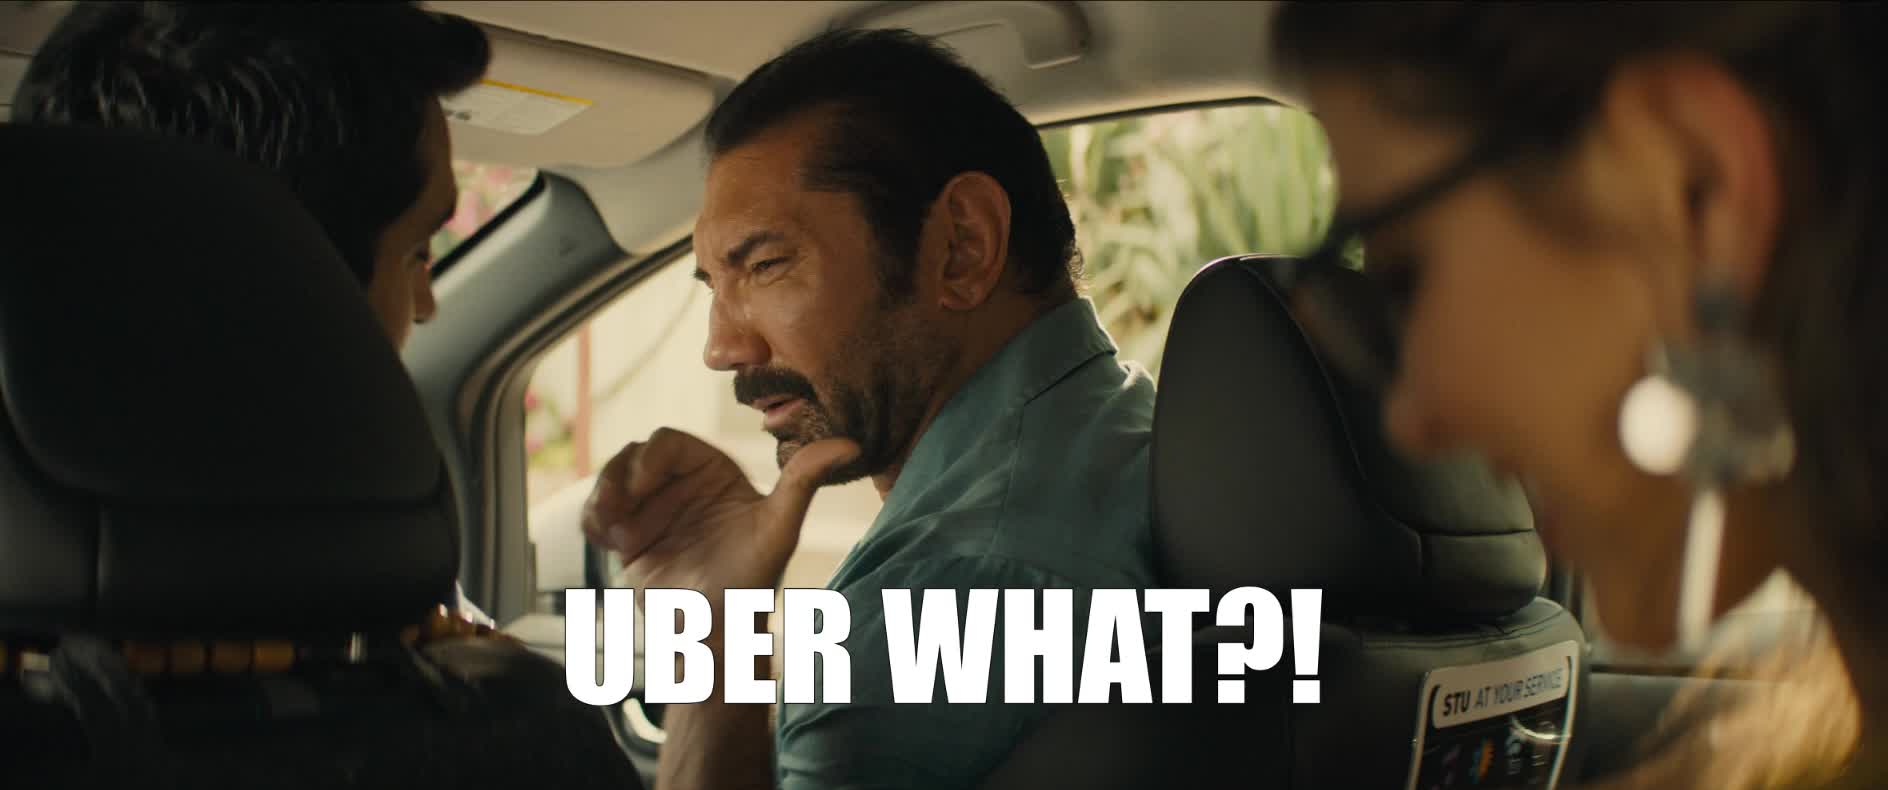 dave bautista, kumail nanjiani, stuber, stuber movie, uber, what, Uber What? GIFs